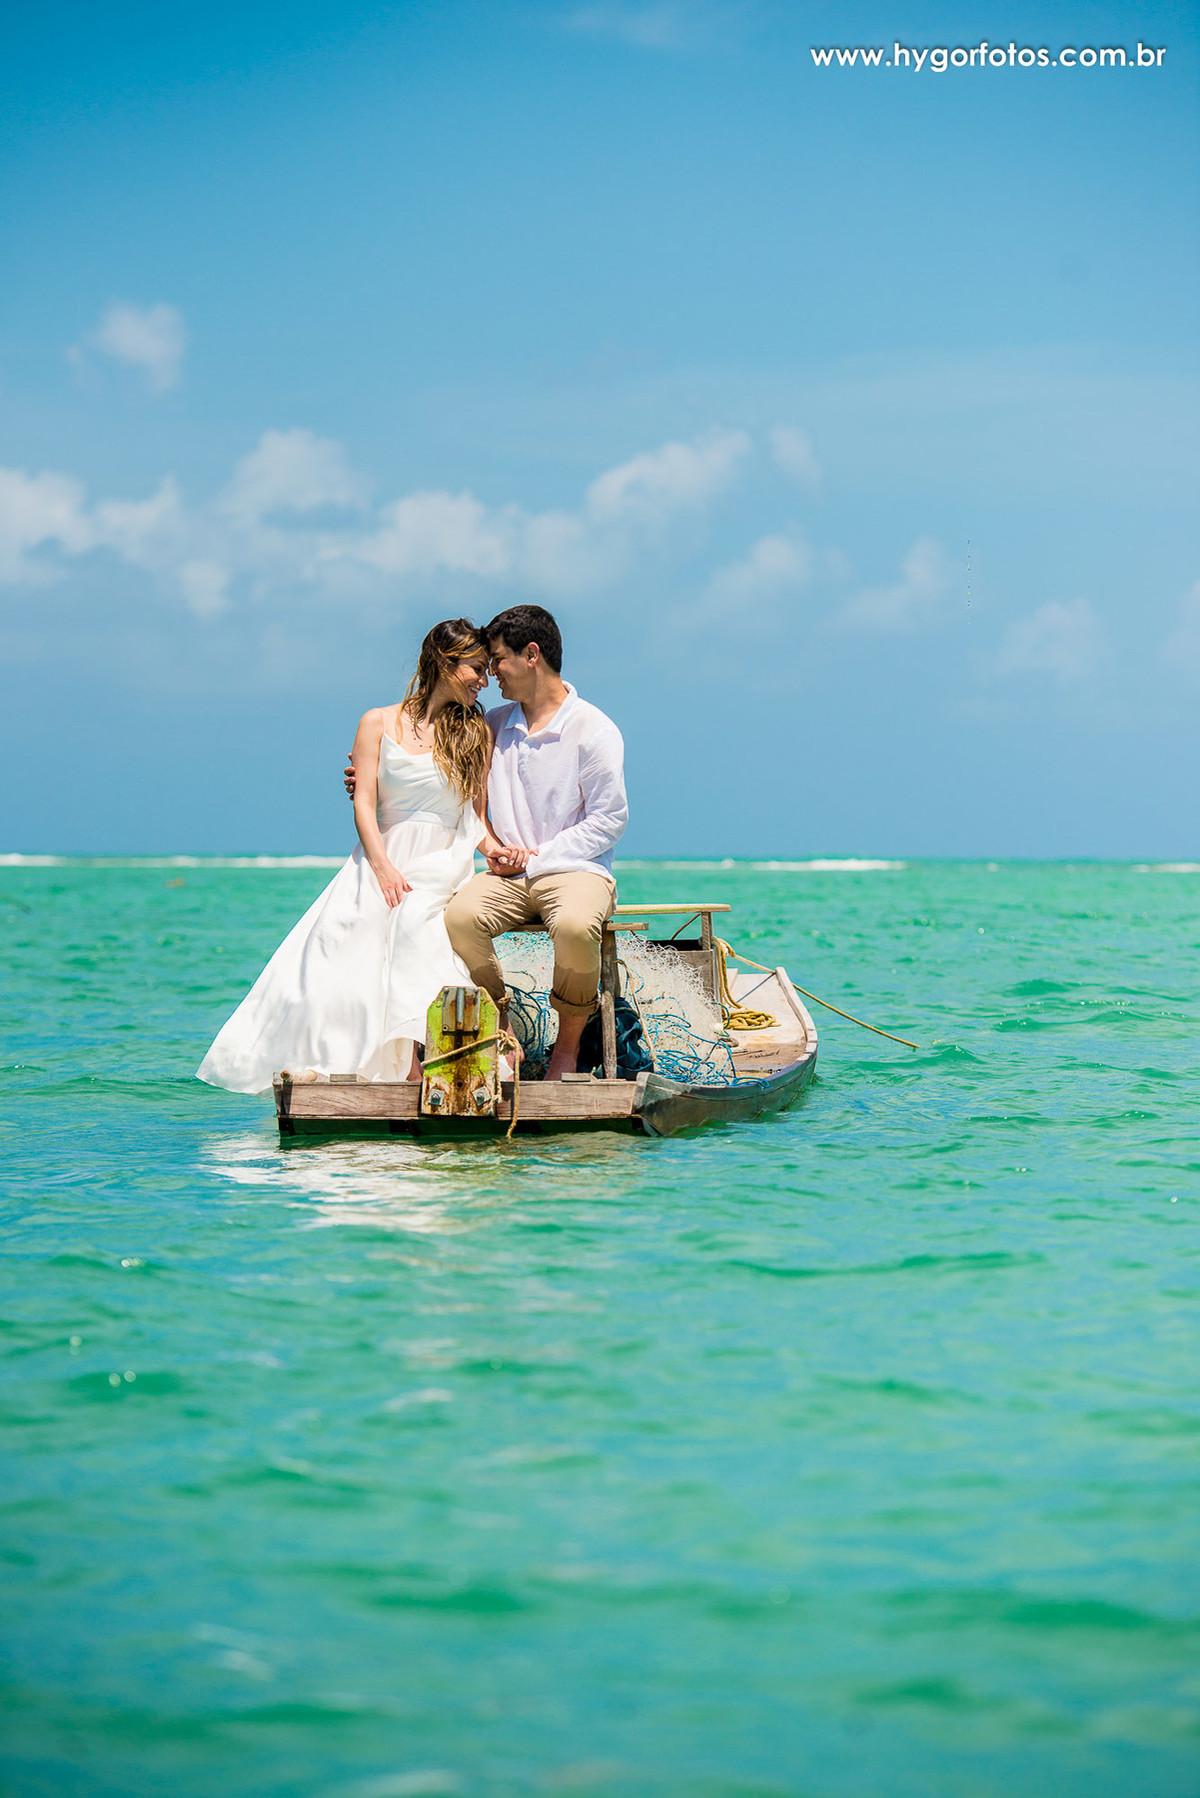 Foto de Ensaio Pós Casamento Carol e Kedman